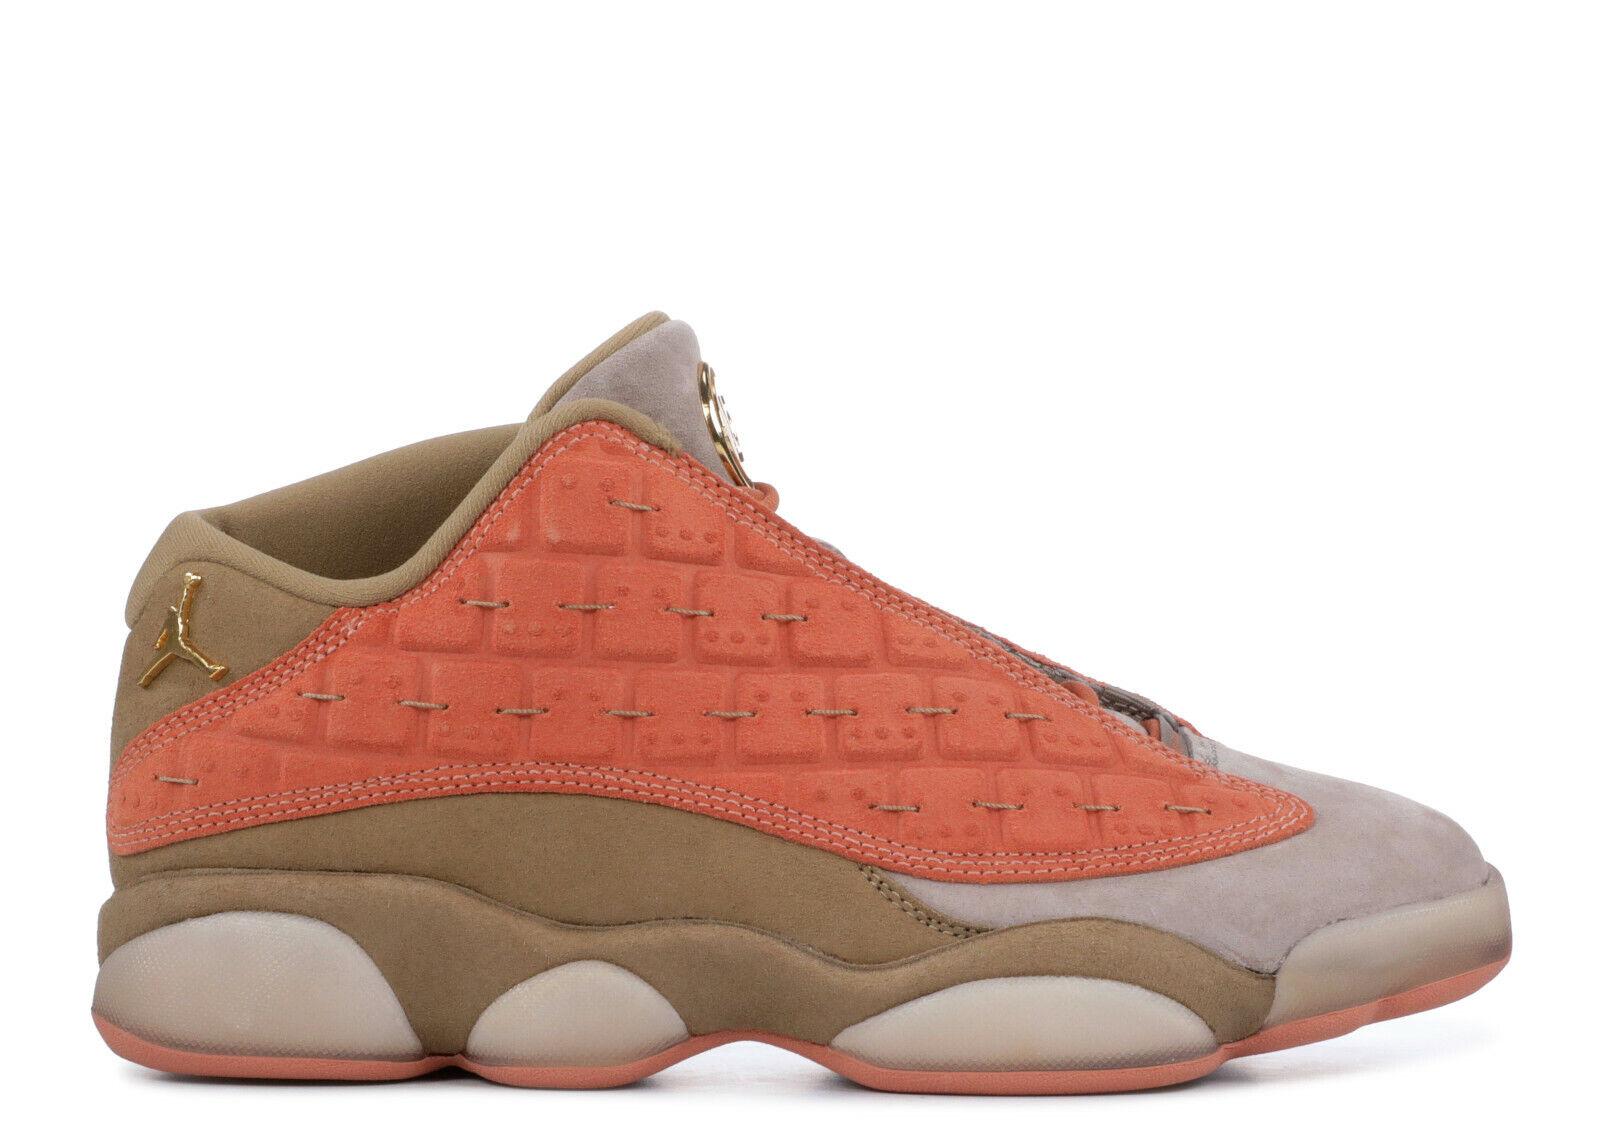 Nike Air Jordan 13 XIII Retro Low Clot Sepia Stone Size 14. AT3102-200